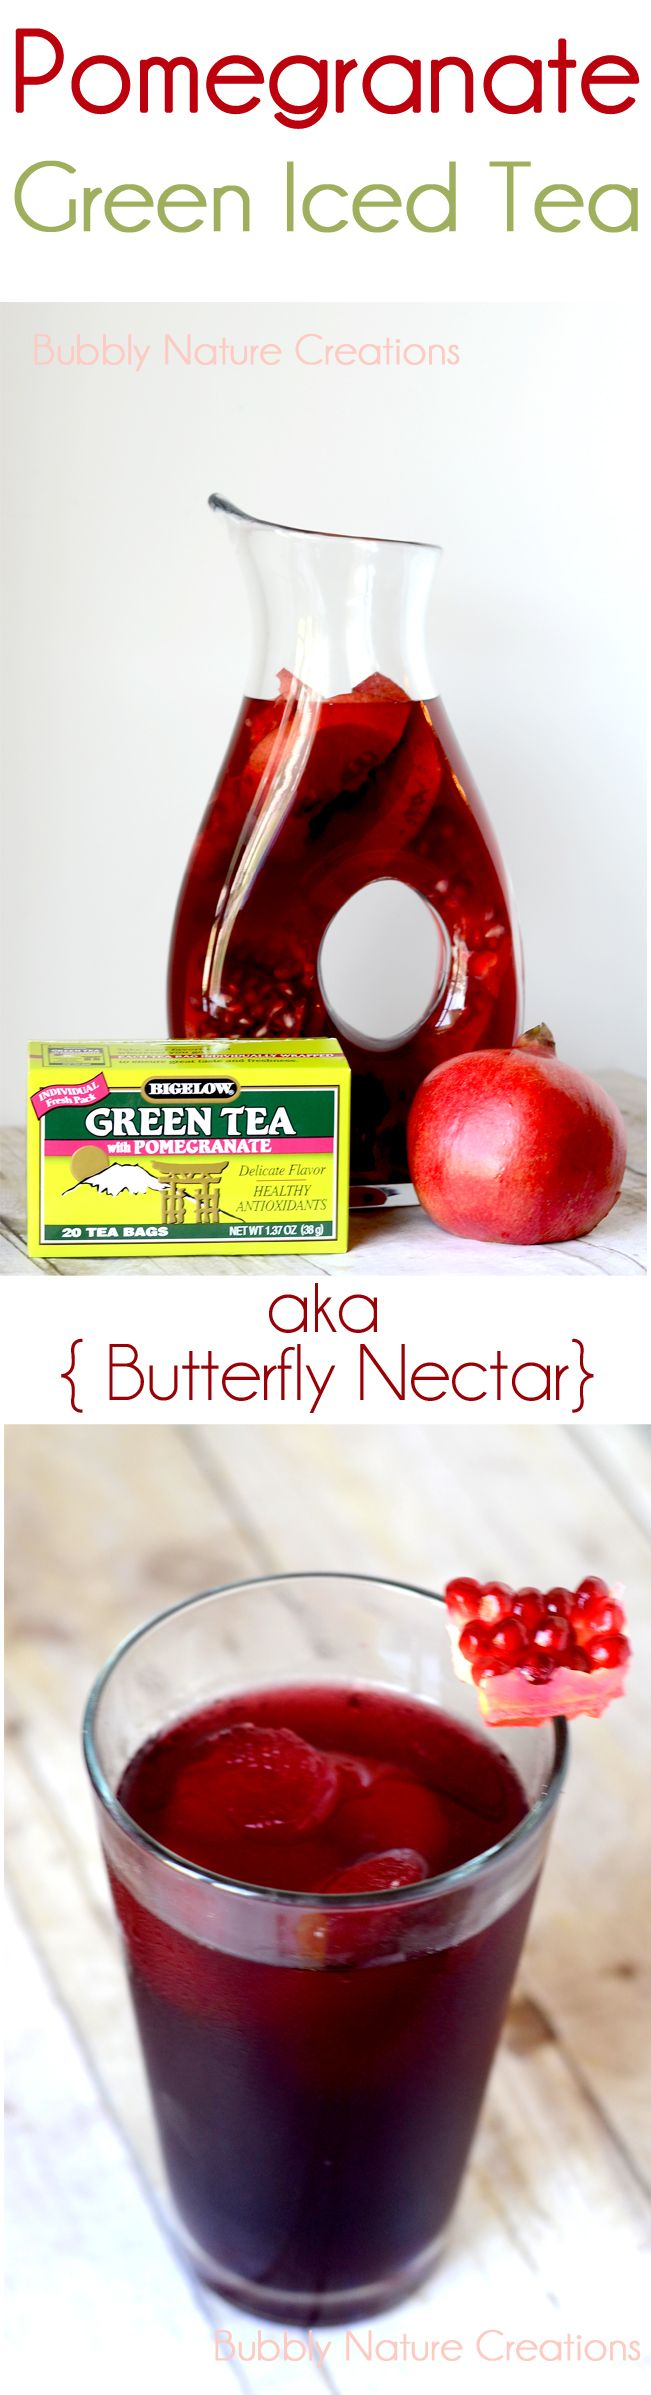 Pomegranate Green Iced Tea - sounds yummy!